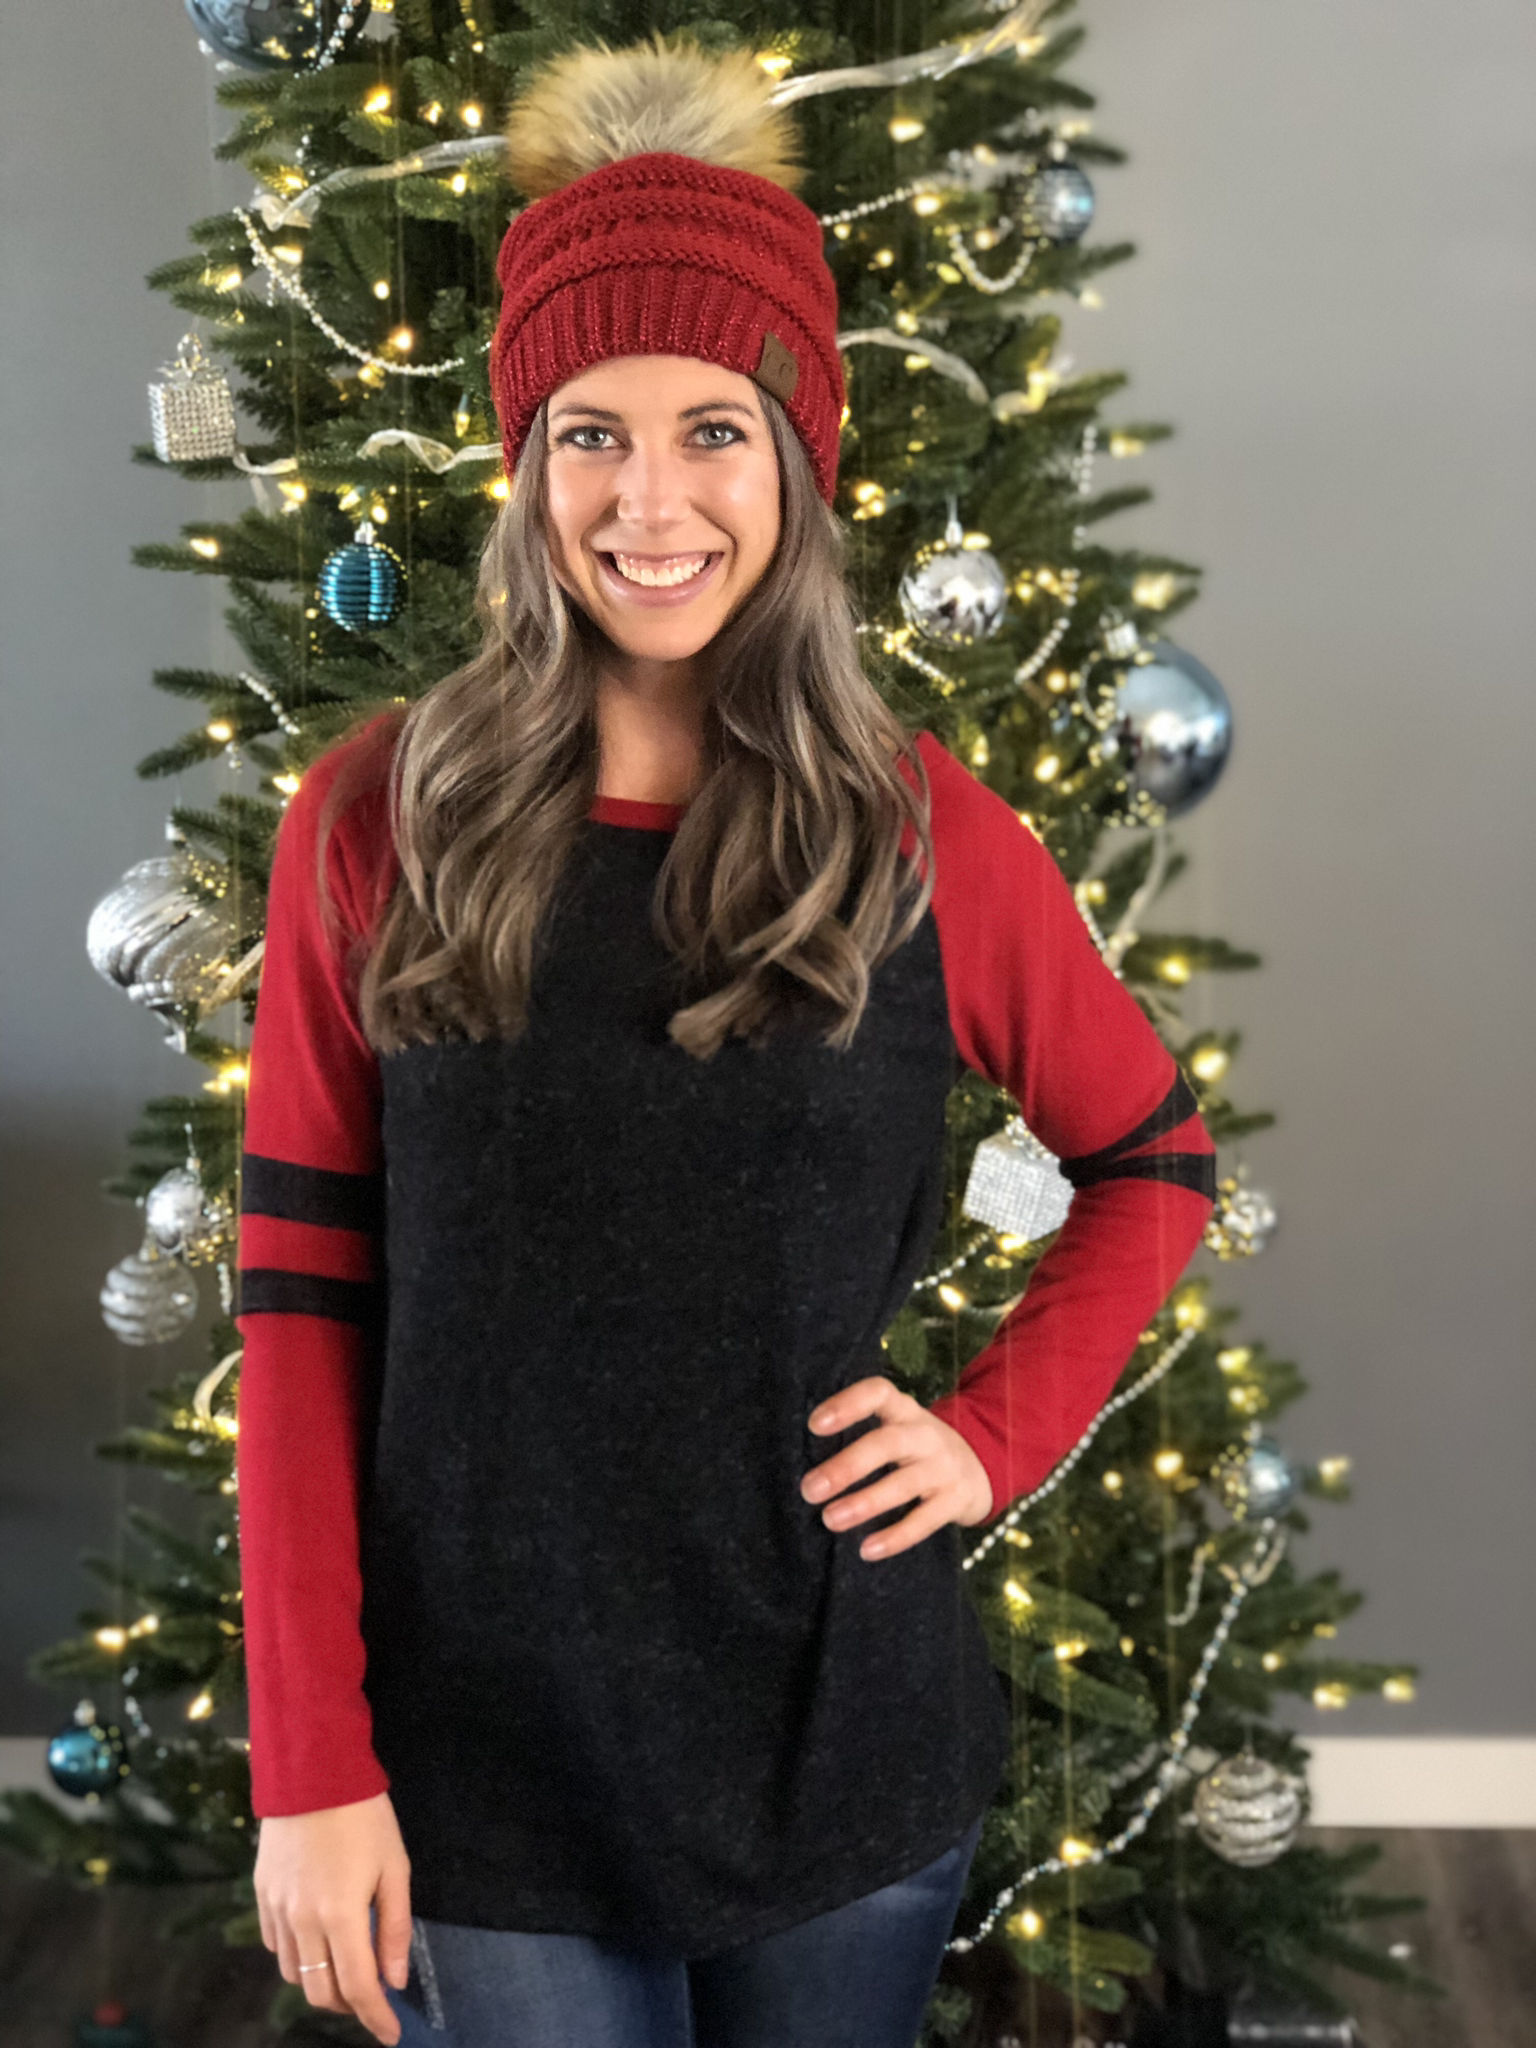 Raglin Sleeve Sweater - Red Black 226655